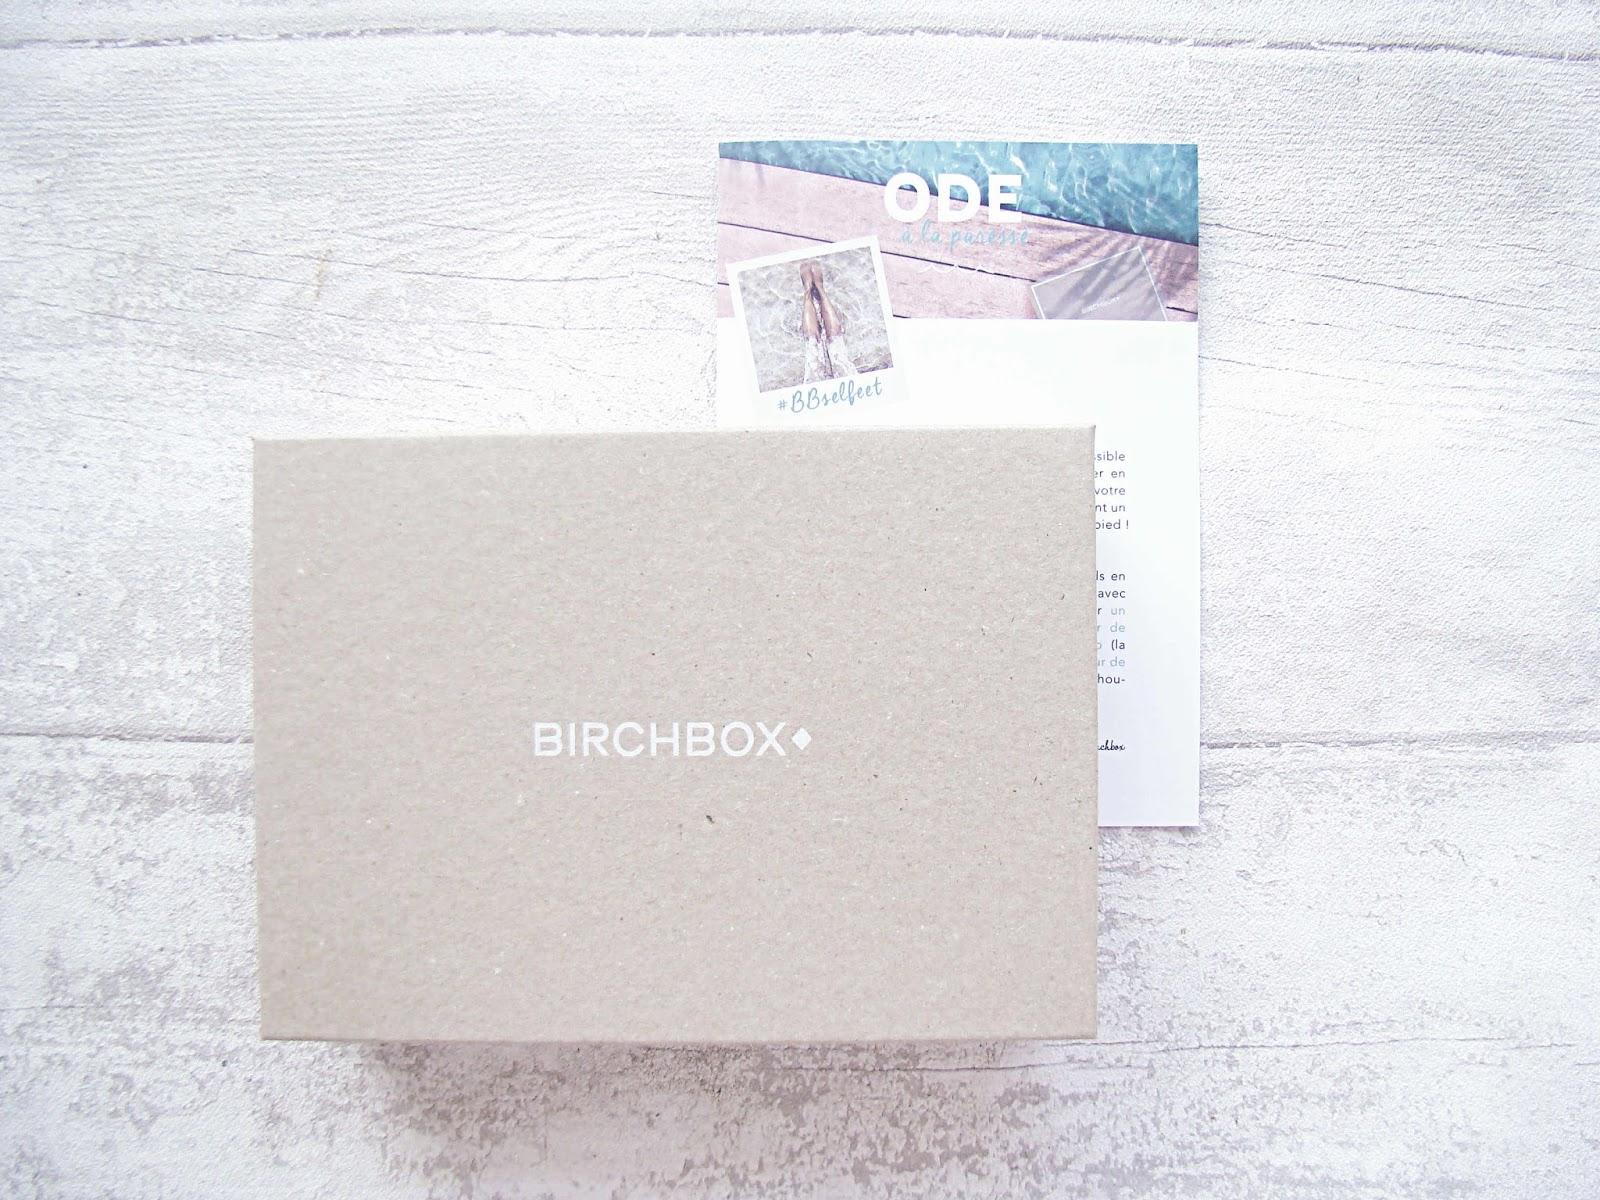 Birchbox août 2014... Ôde à la paresse